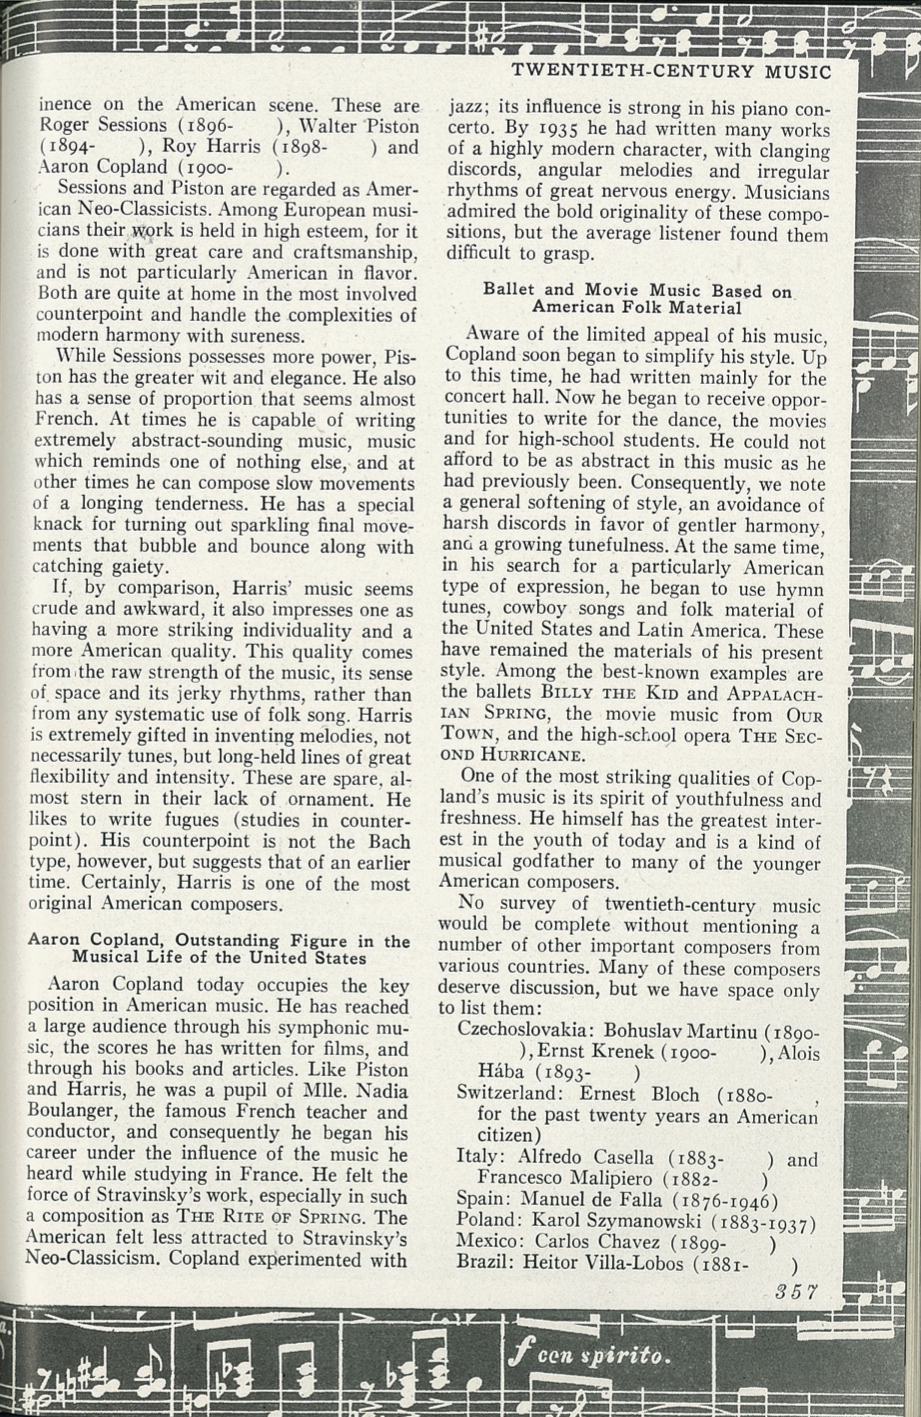 Fine Page 357